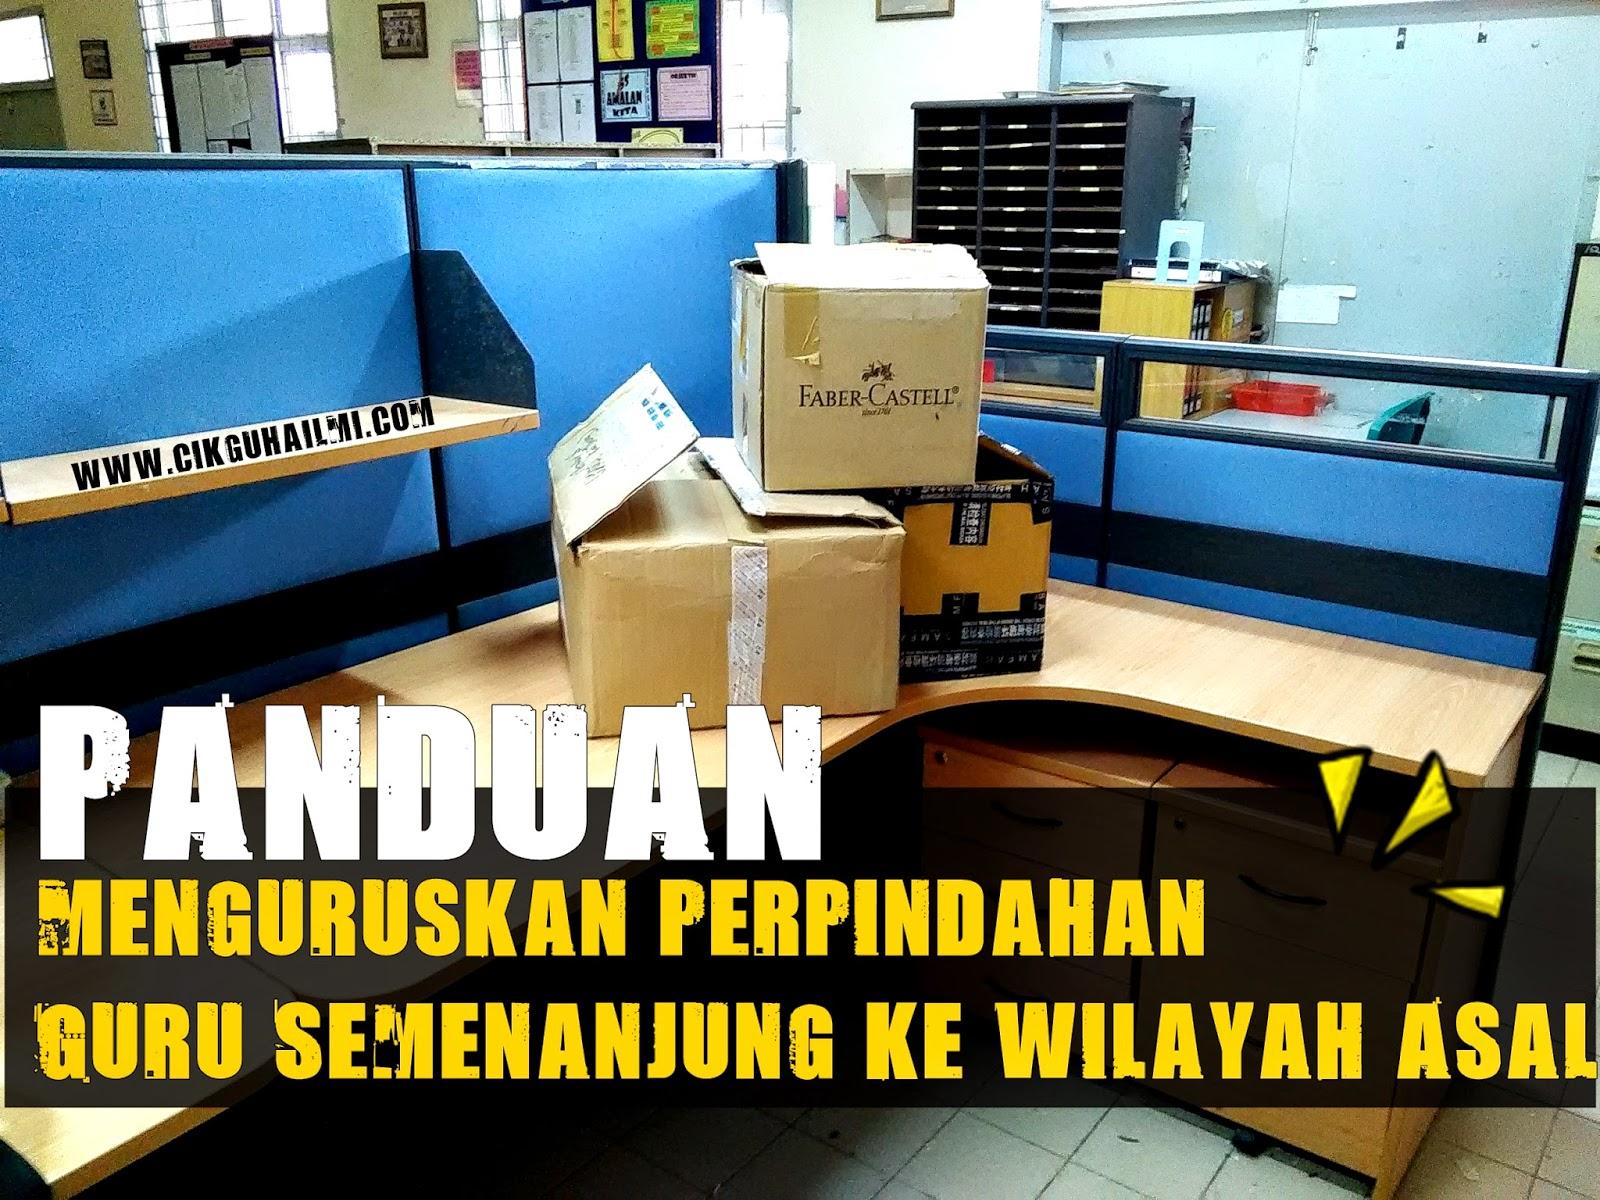 Panduan Menguruskan Perpindahan Guru Semenanjung ke Wilayah Asal